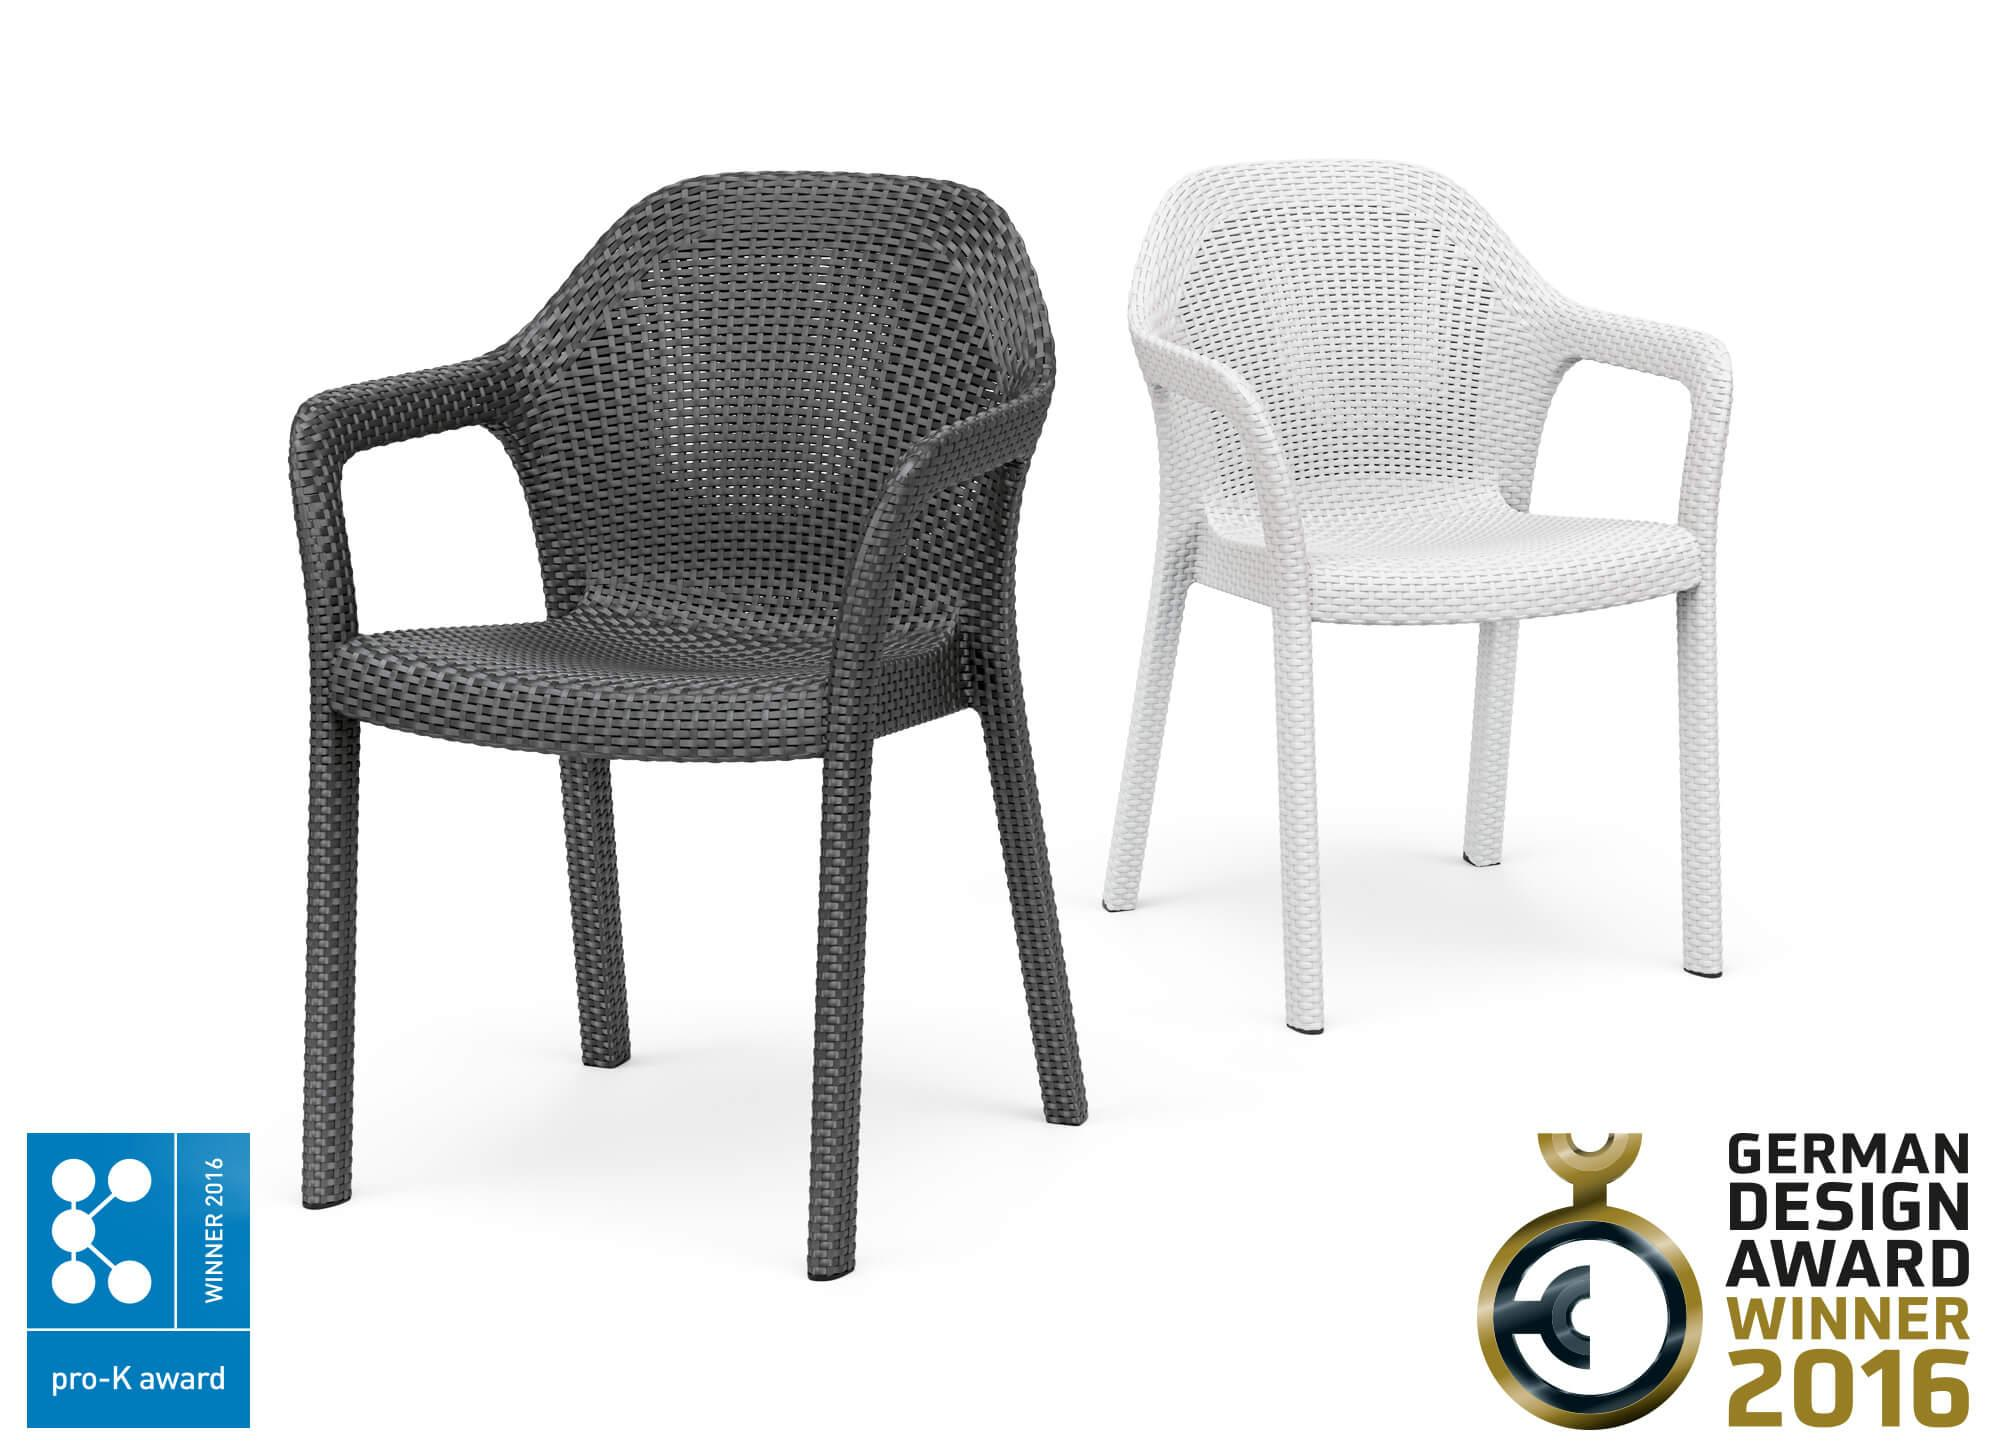 Our chair has already won the GERMAN DESIGN AWARD